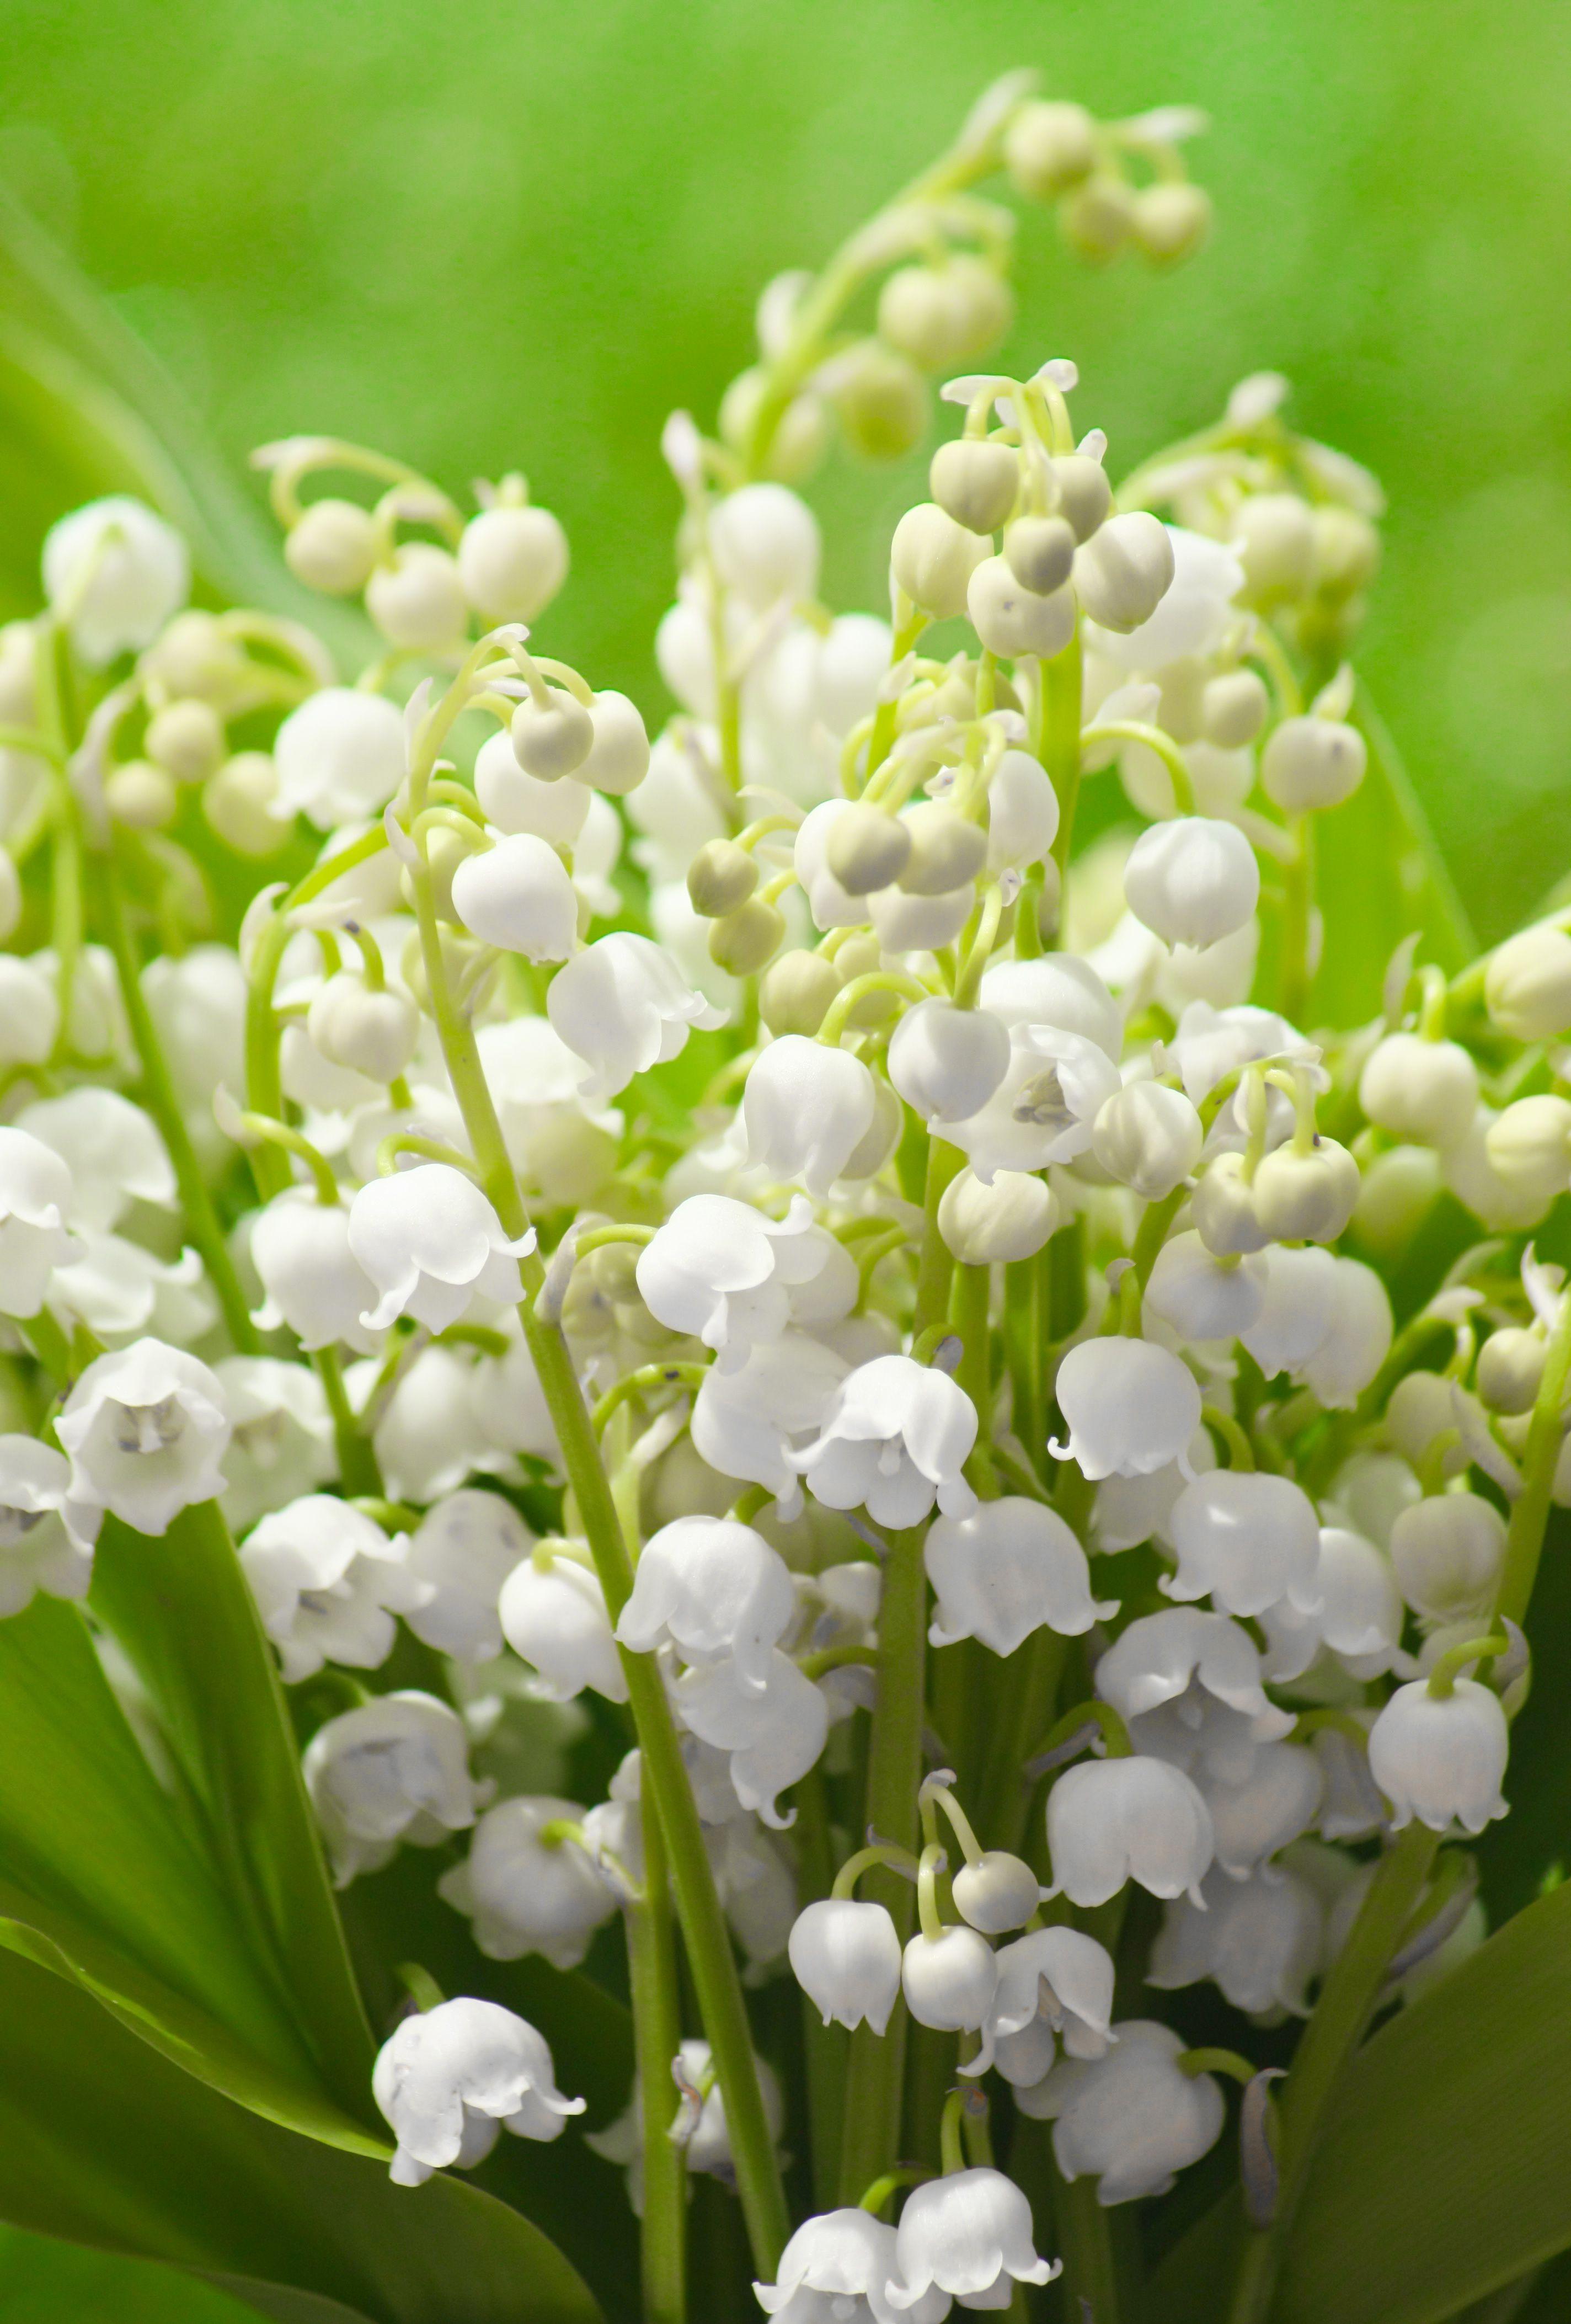 Mon Jardin En Avril Épinglé sur mon jardin blanc